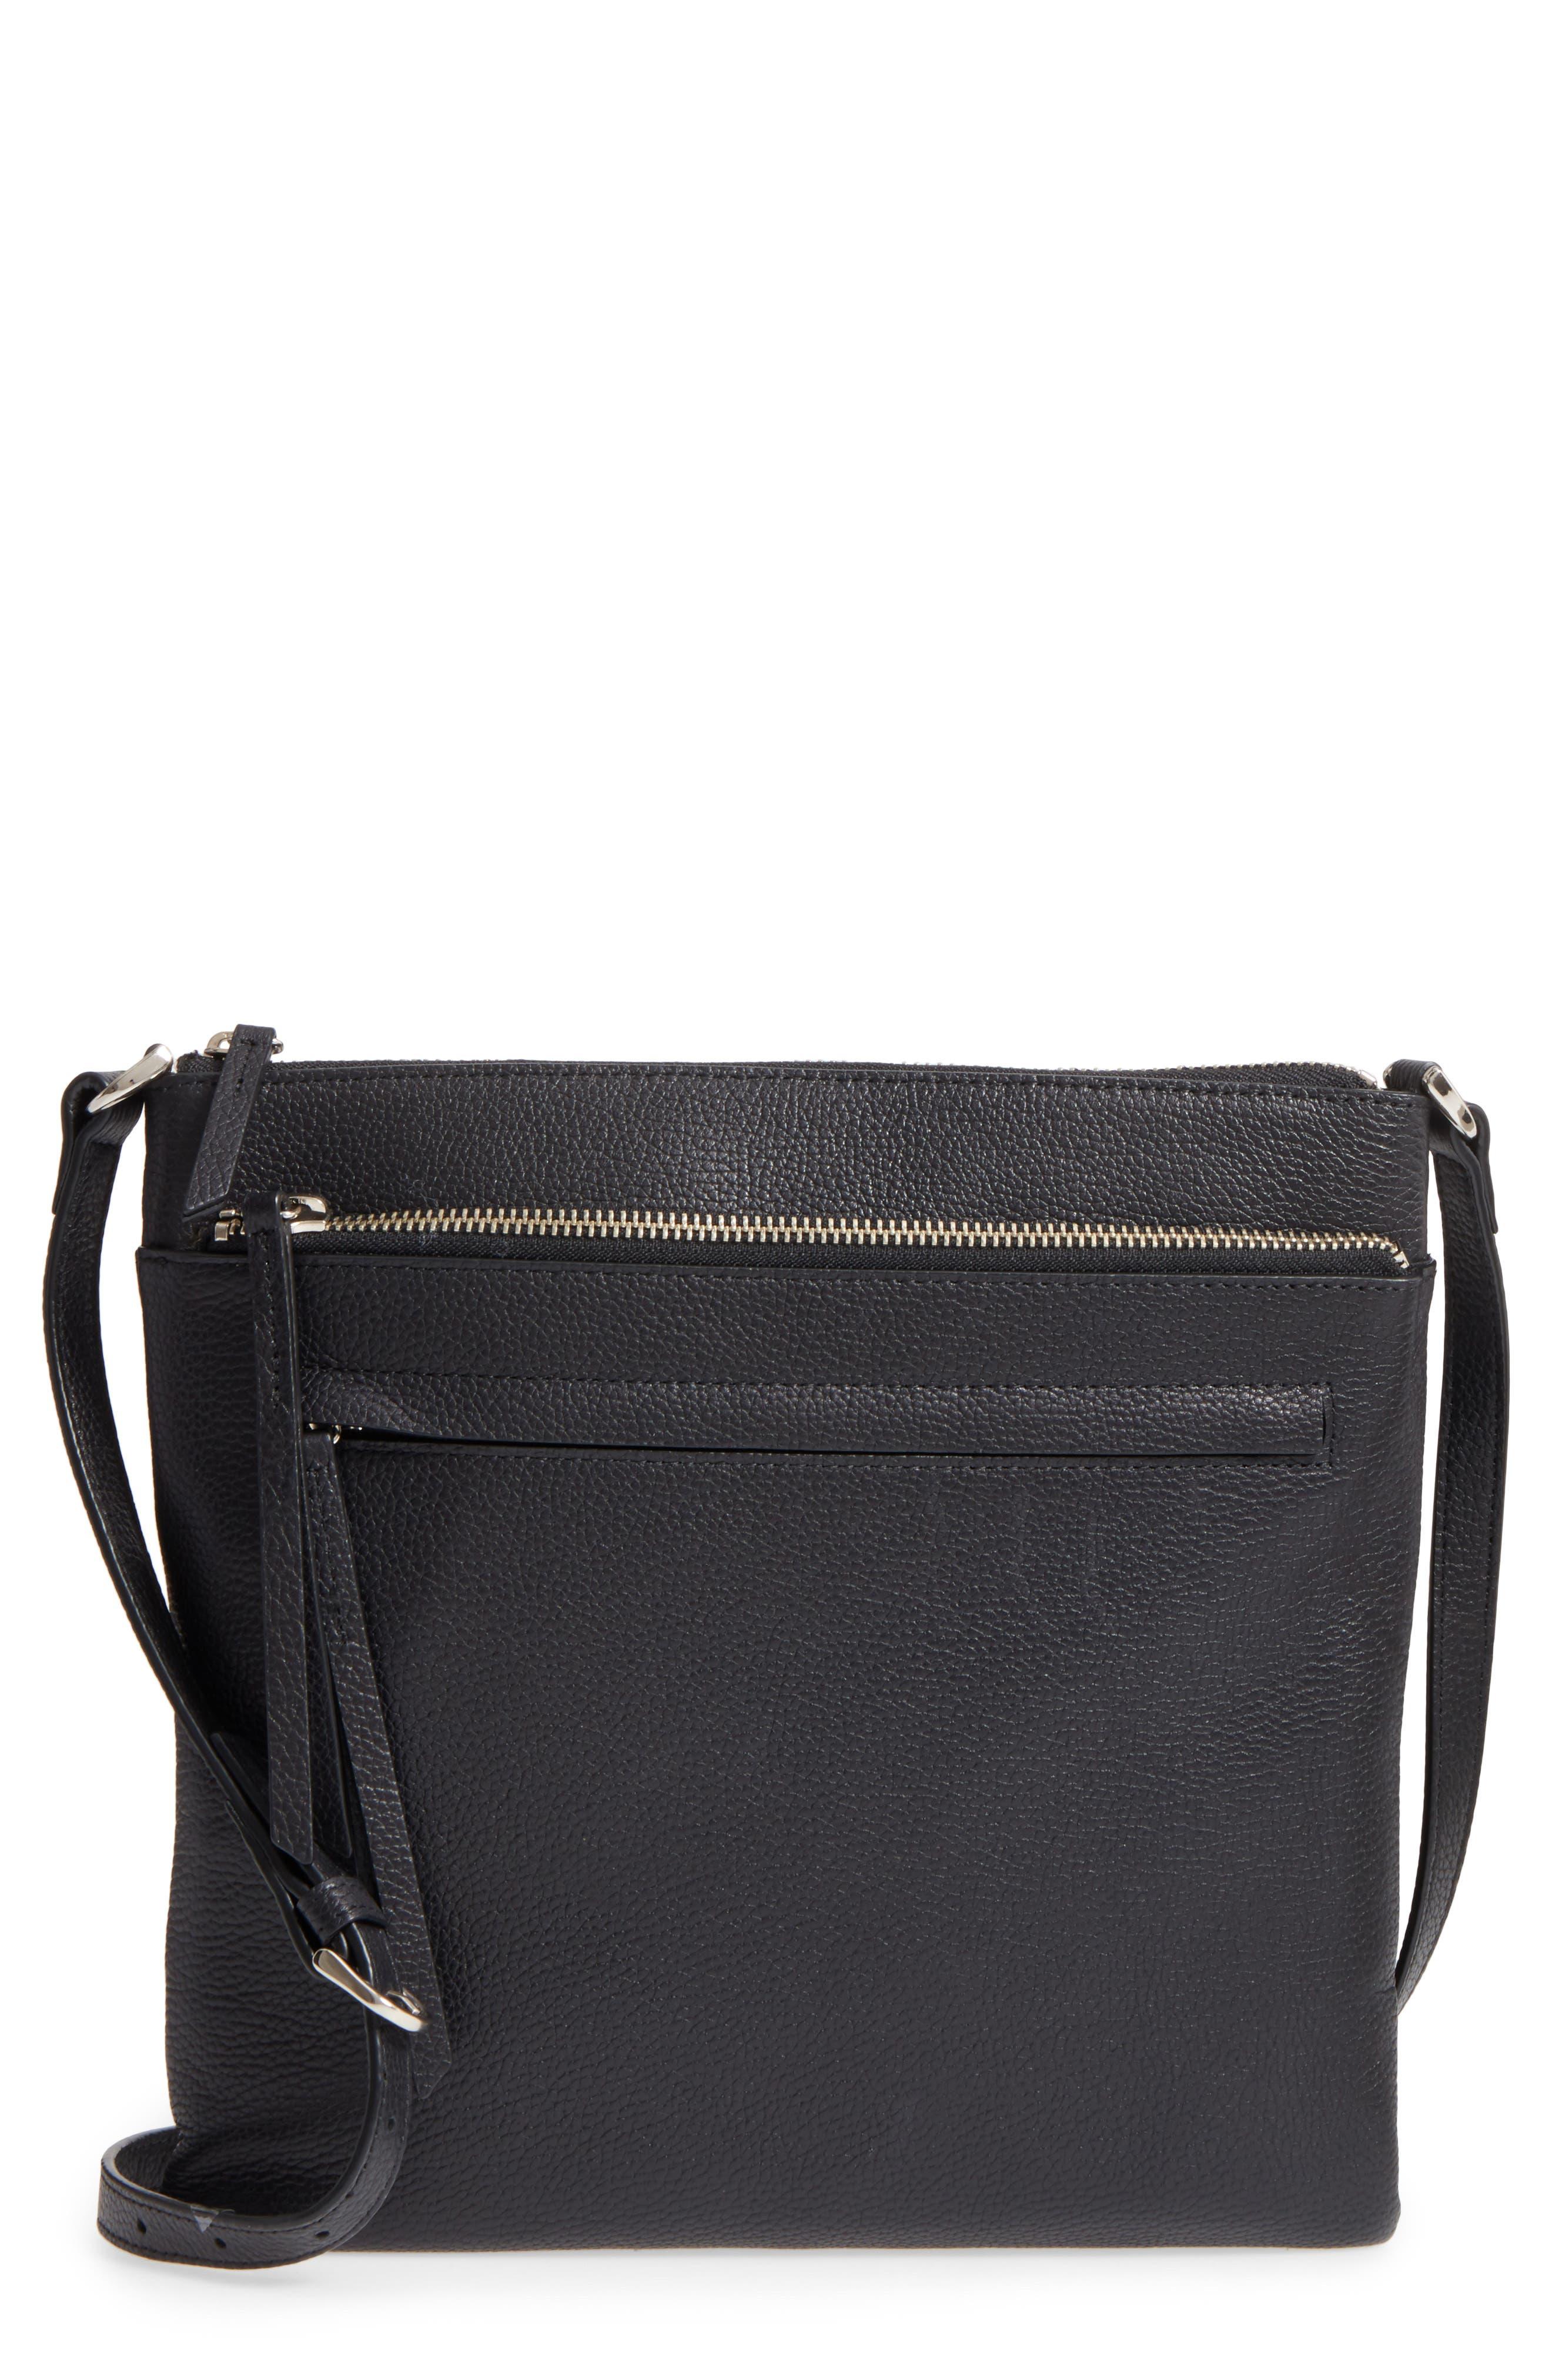 NORDSTROM Finn Leather Crossbody Bag, Main, color, BLACK